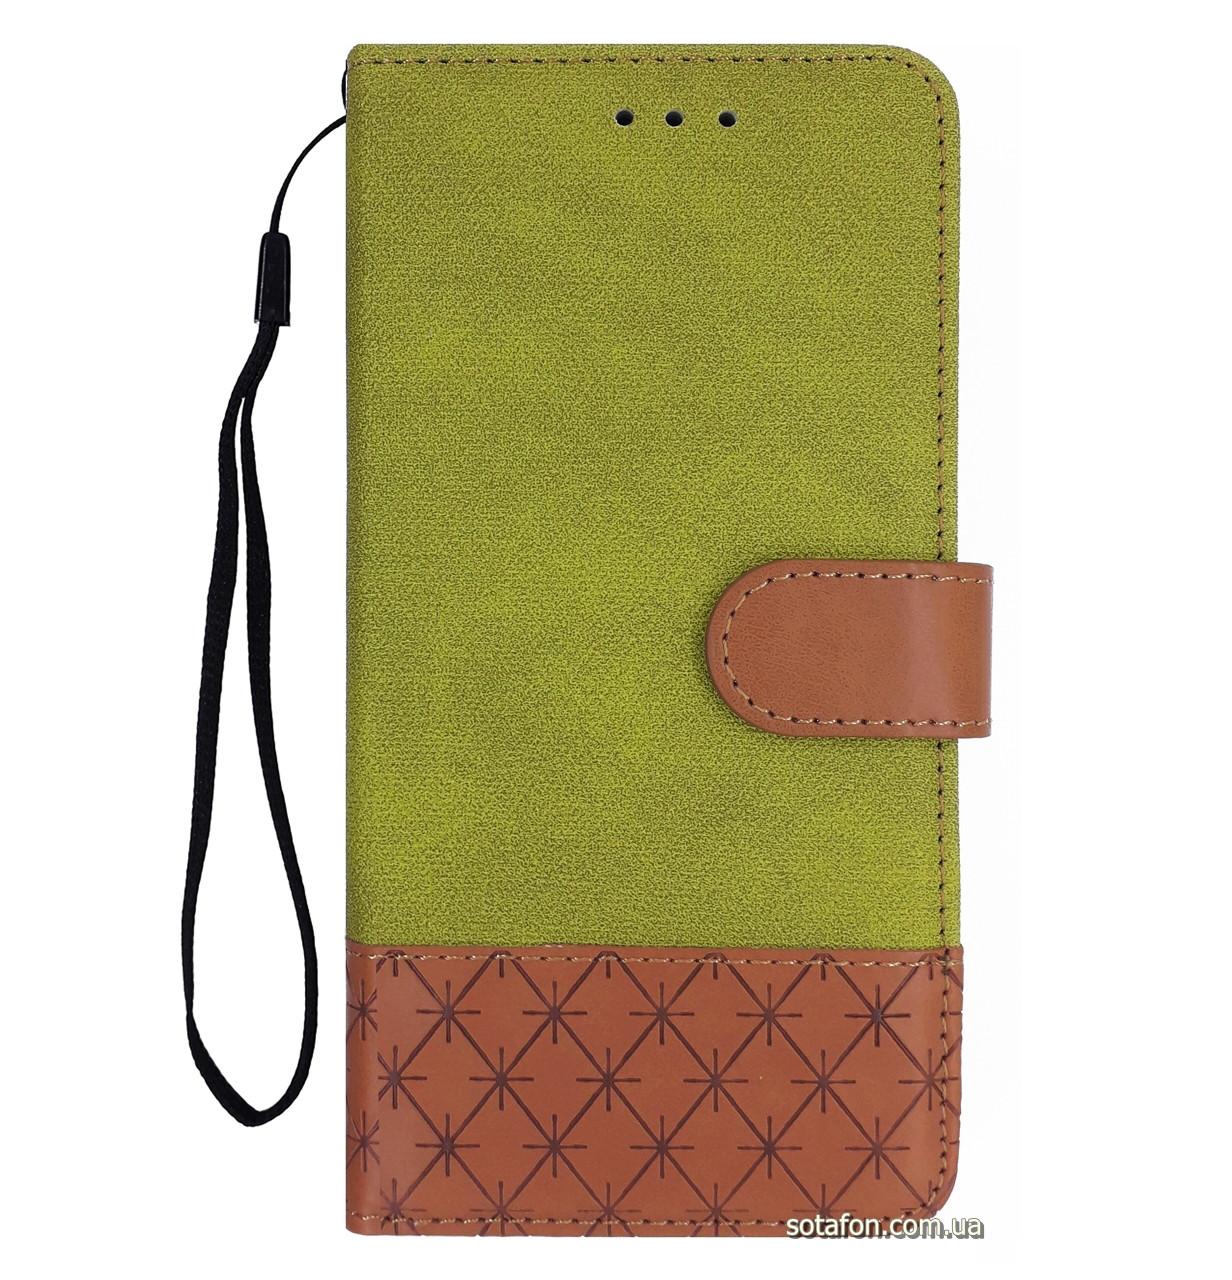 Чехол-книжка Diary c TPU креплением и функцией подставки для Samsung Galaxy J3 (2017) SM-J330F Lime Green